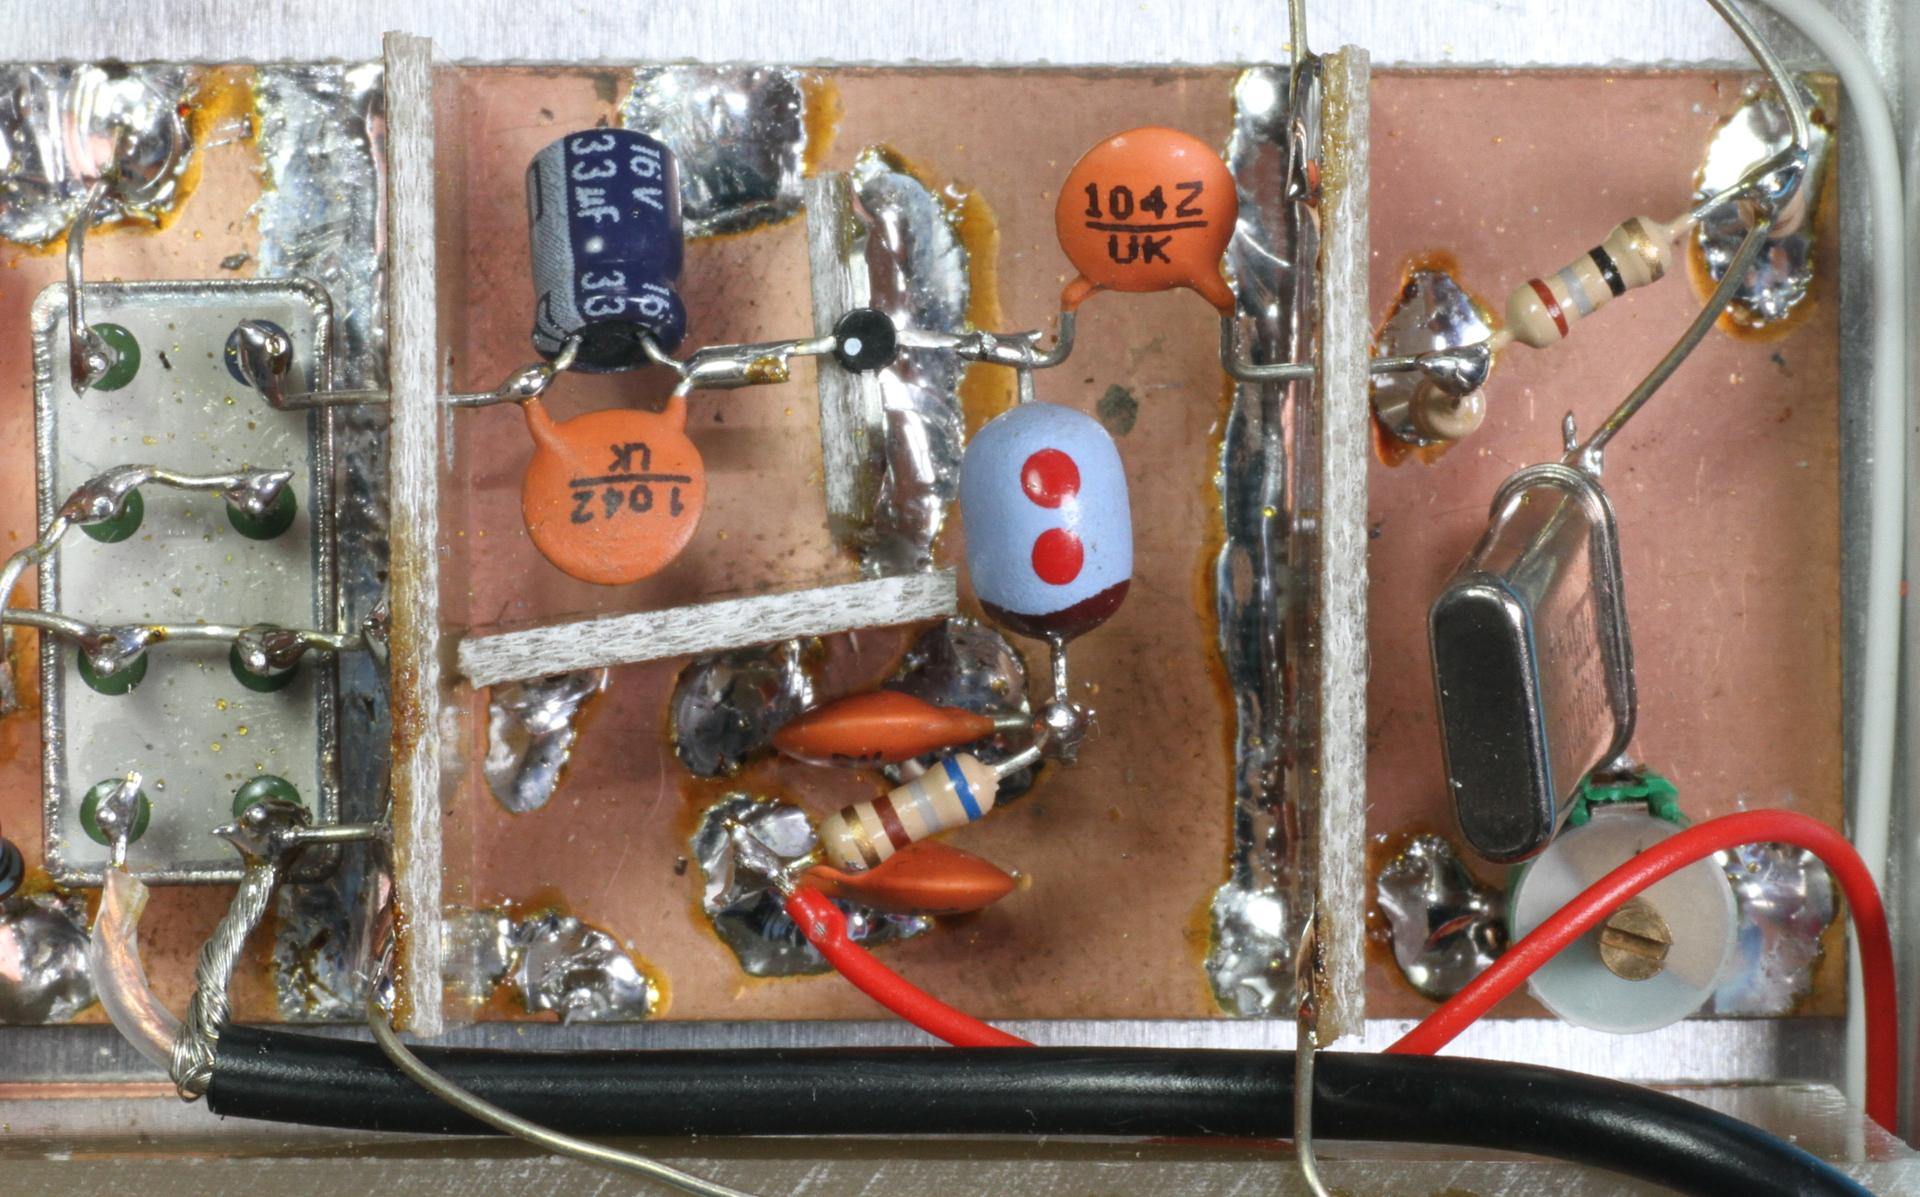 Tb6612fng Dual Dc Motor Driver Module 4 5 13 5v 3a Australia further Tda8571j 4x40w Oto  lifikator additionally LA4440 also Power System Protection Topic 1 furthermore Gas Leakage Alarm Using Mq 6 Sensor Sensor Circuit 14. on dc power supply circuit diagram